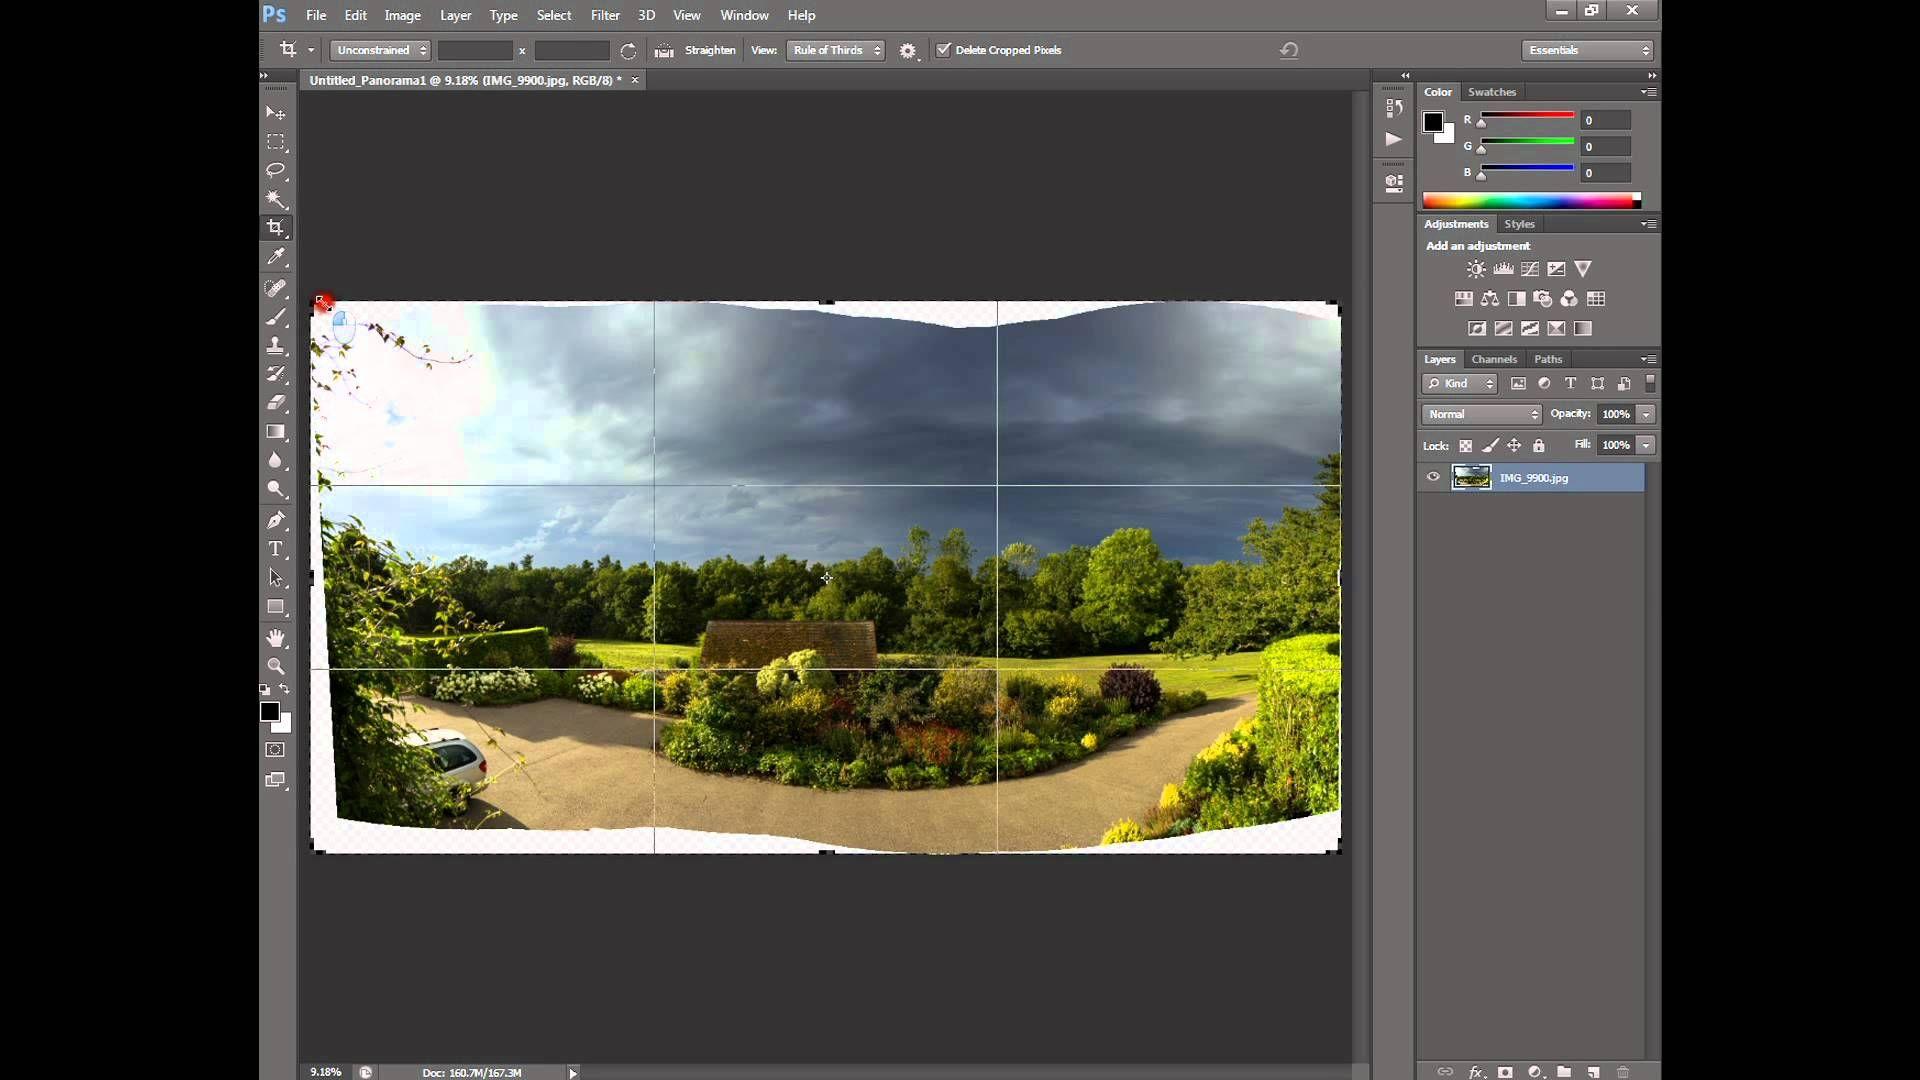 Photoshop cs6 panorama tutorial by gardner photography going photoshop cs6 panorama tutorial by gardner photography baditri Gallery